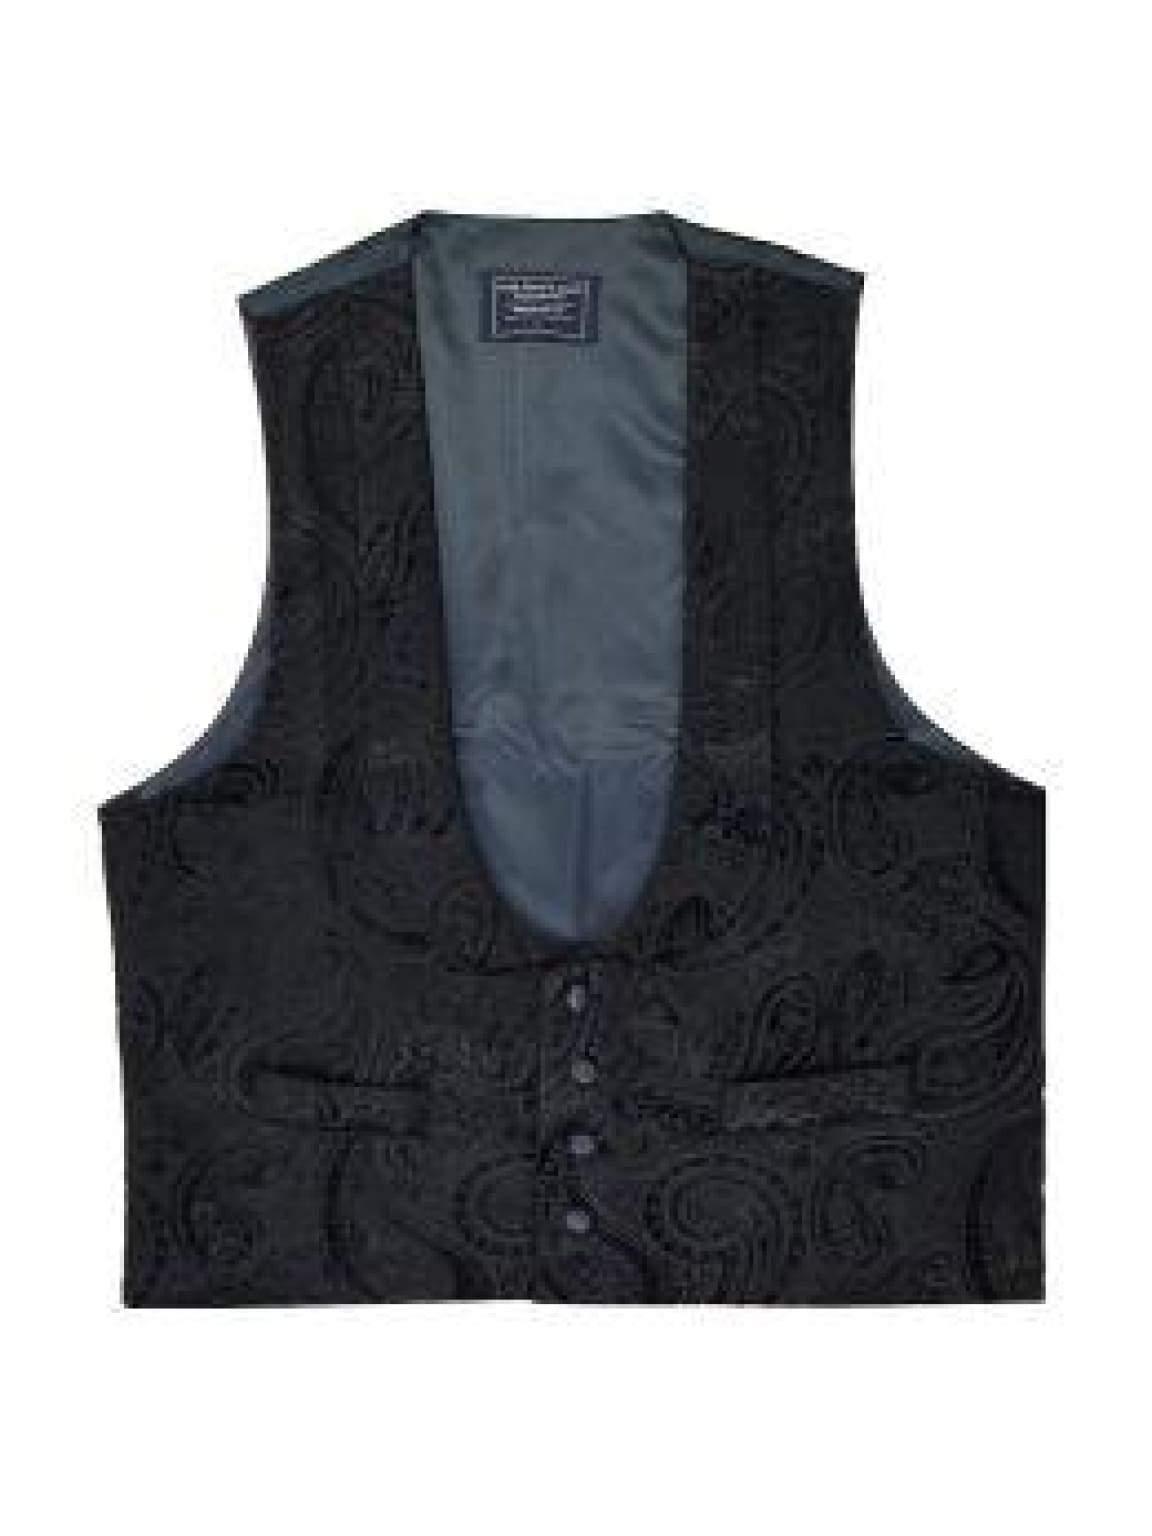 L A Smith Black Velvet Scoop Evening Waistcoat - Suit & Tailoring